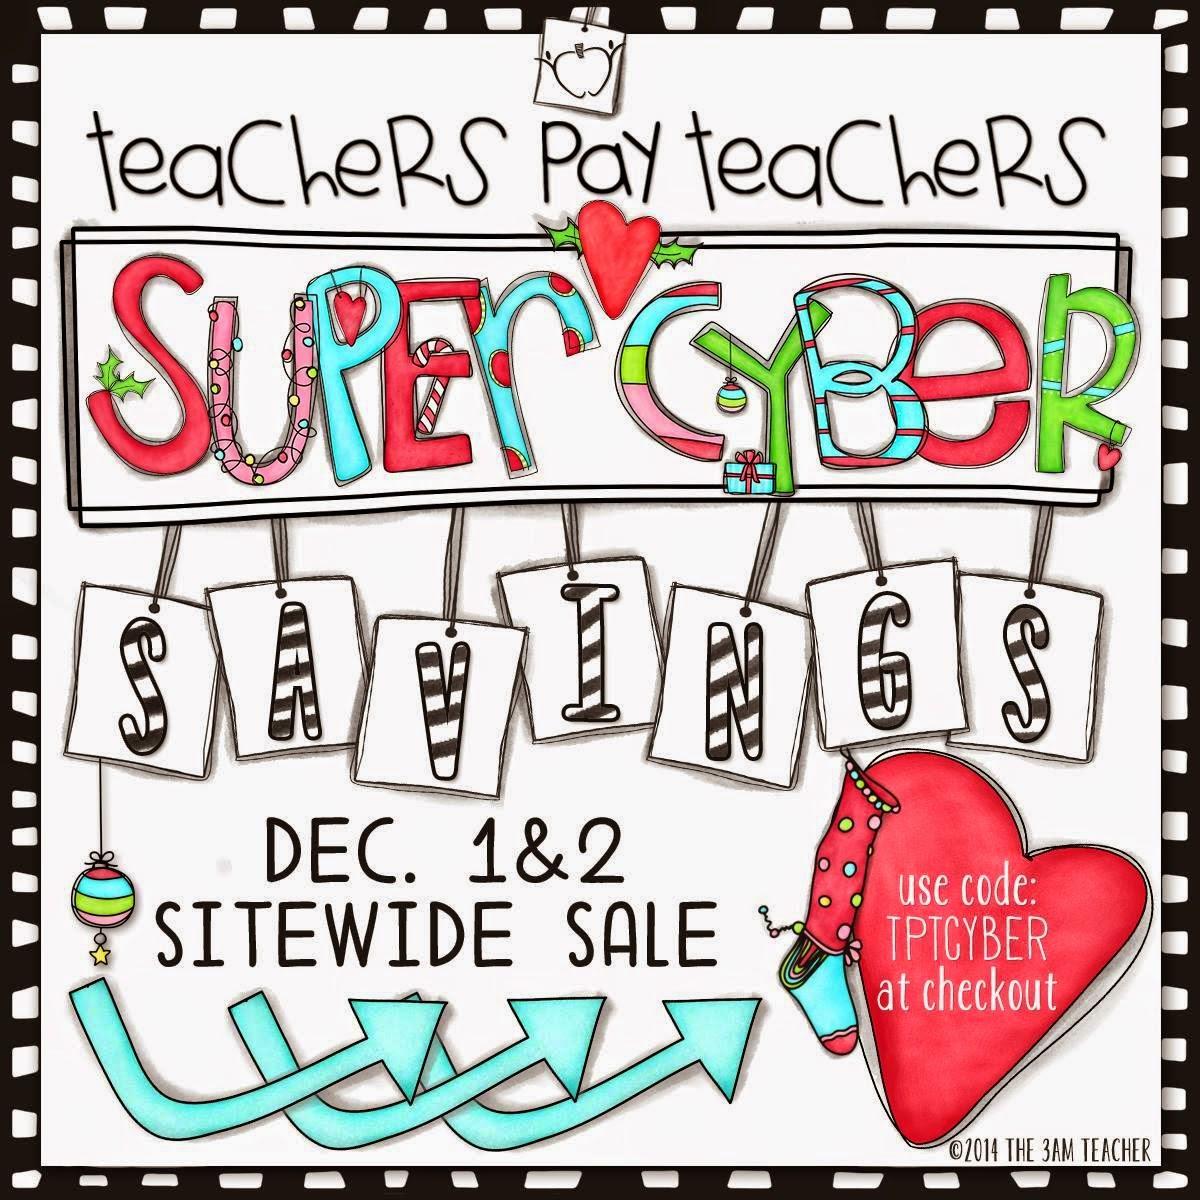 http://www.teacherspayteachers.com/Store/Kathy-O